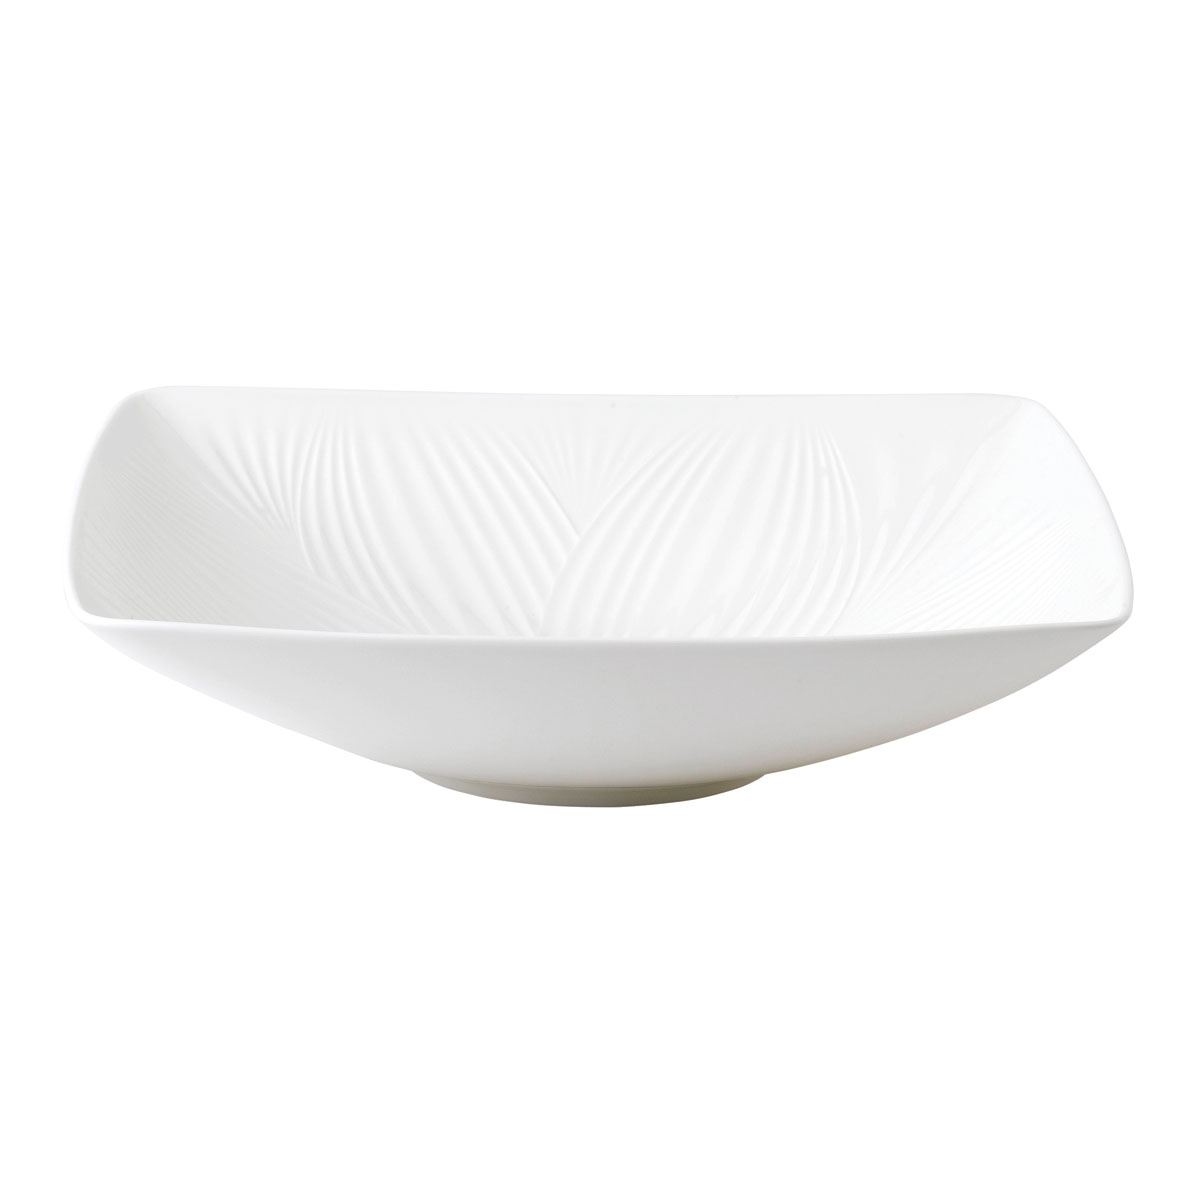 "Wedgwood China White Folia Sculptural Bowl 10.2"""